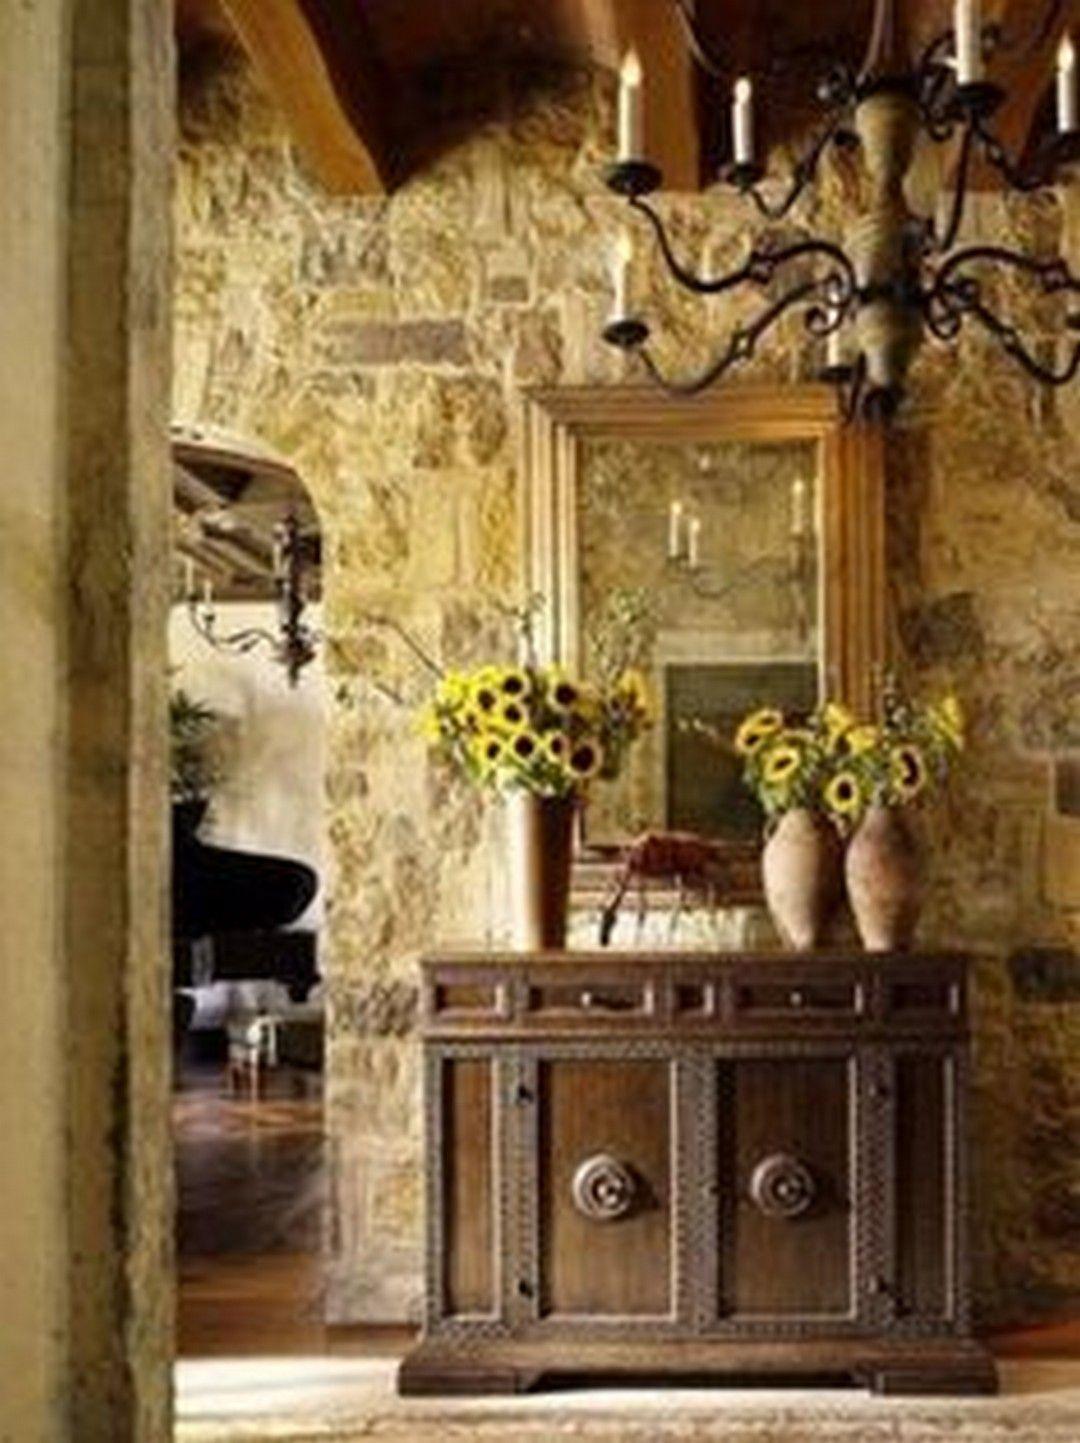 10 Gorgeous Italian Farmhouse Decor Ideas To Beautify Any Room Https Www